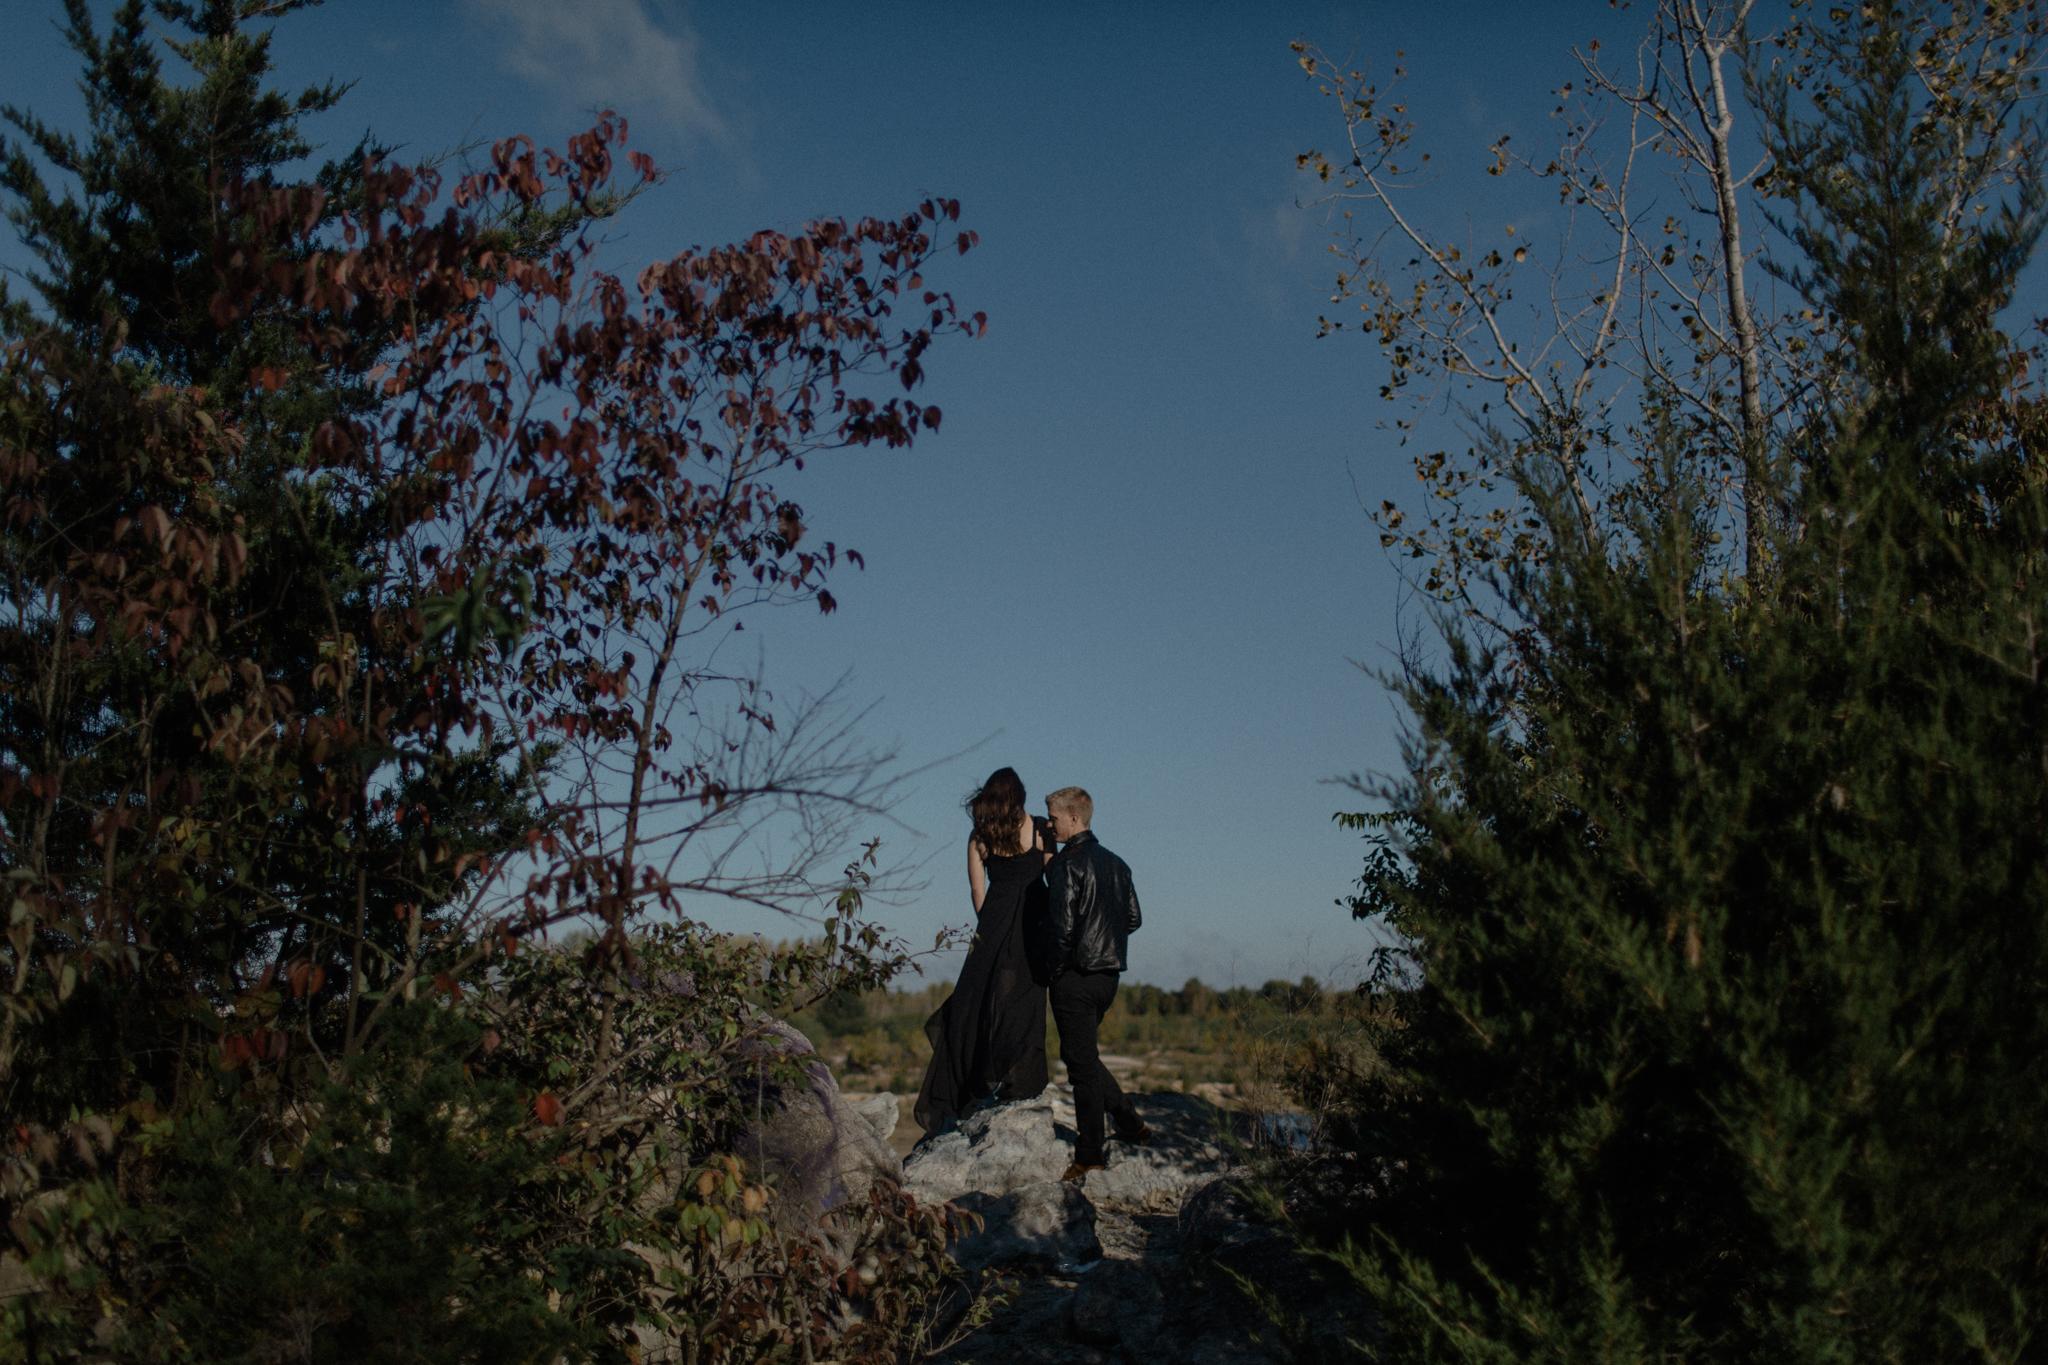 caleb emily engagement photos sarah rose photography dayton columbus cincinnati ohio desert inspired session